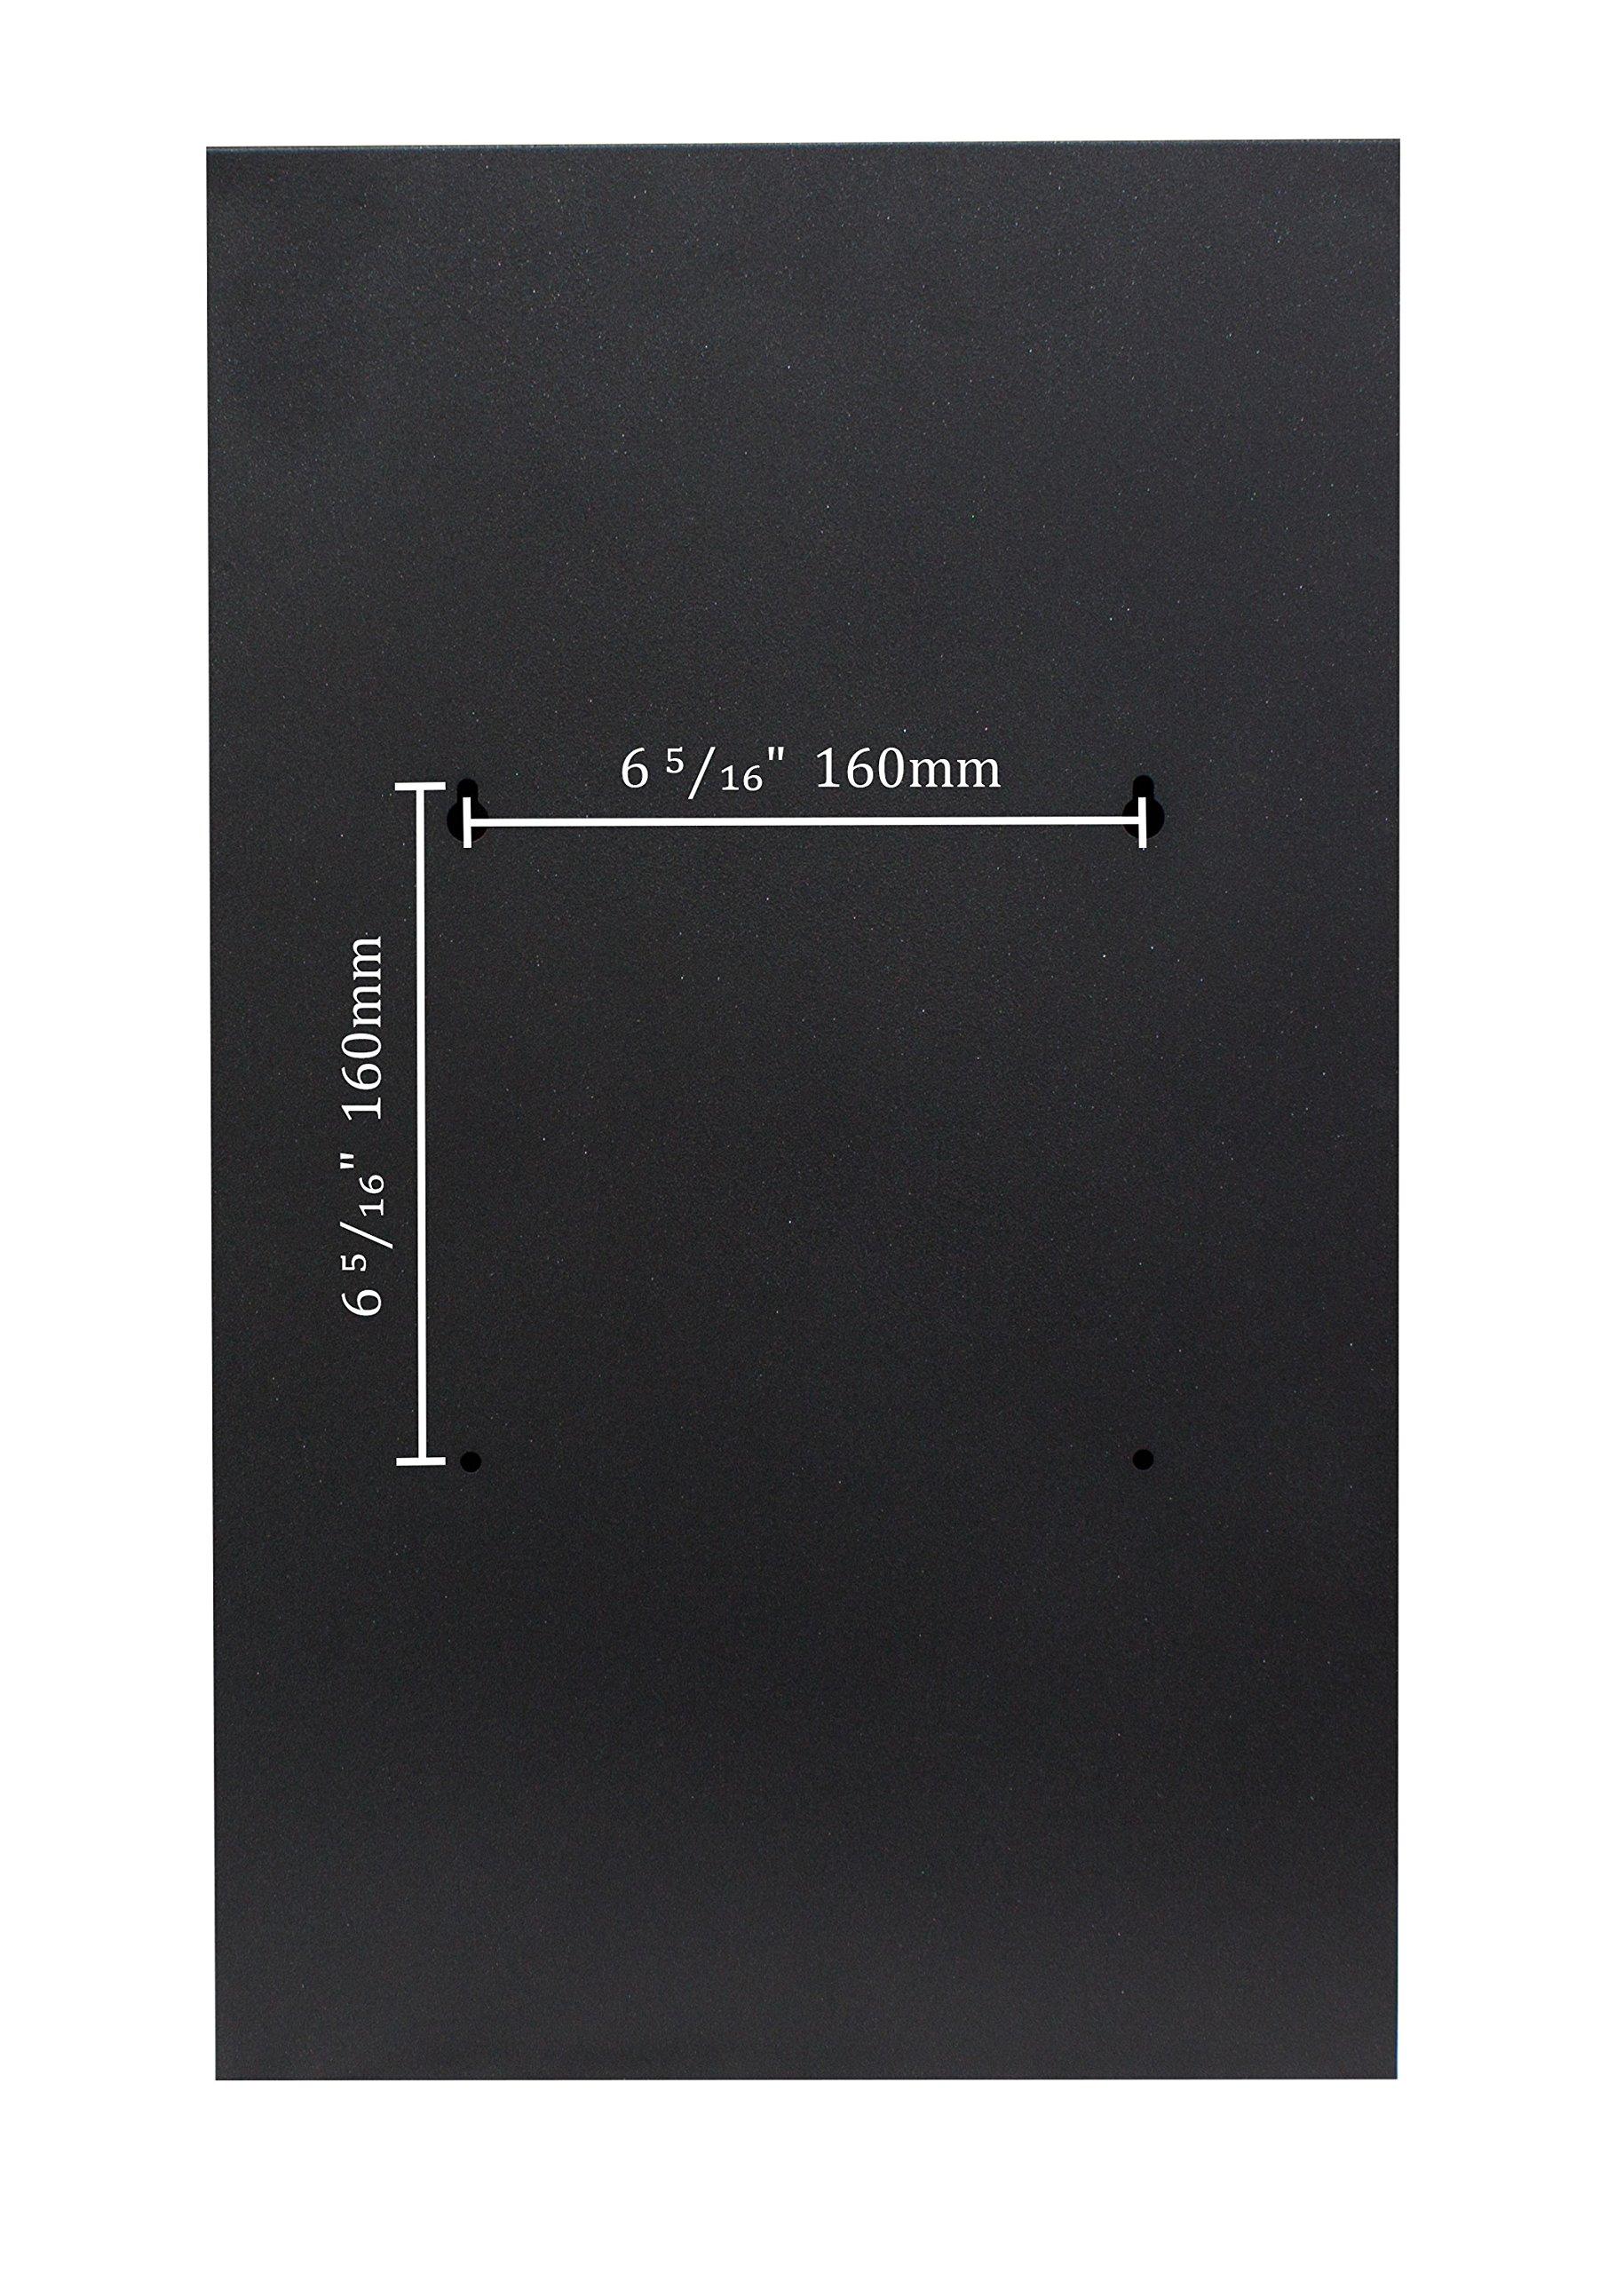 Qualarc WF-PM18 Verse Wall Mount Rectangular Stainless Steel Front Locking Mailbox, Silver/Black by Qualarc (Image #4)